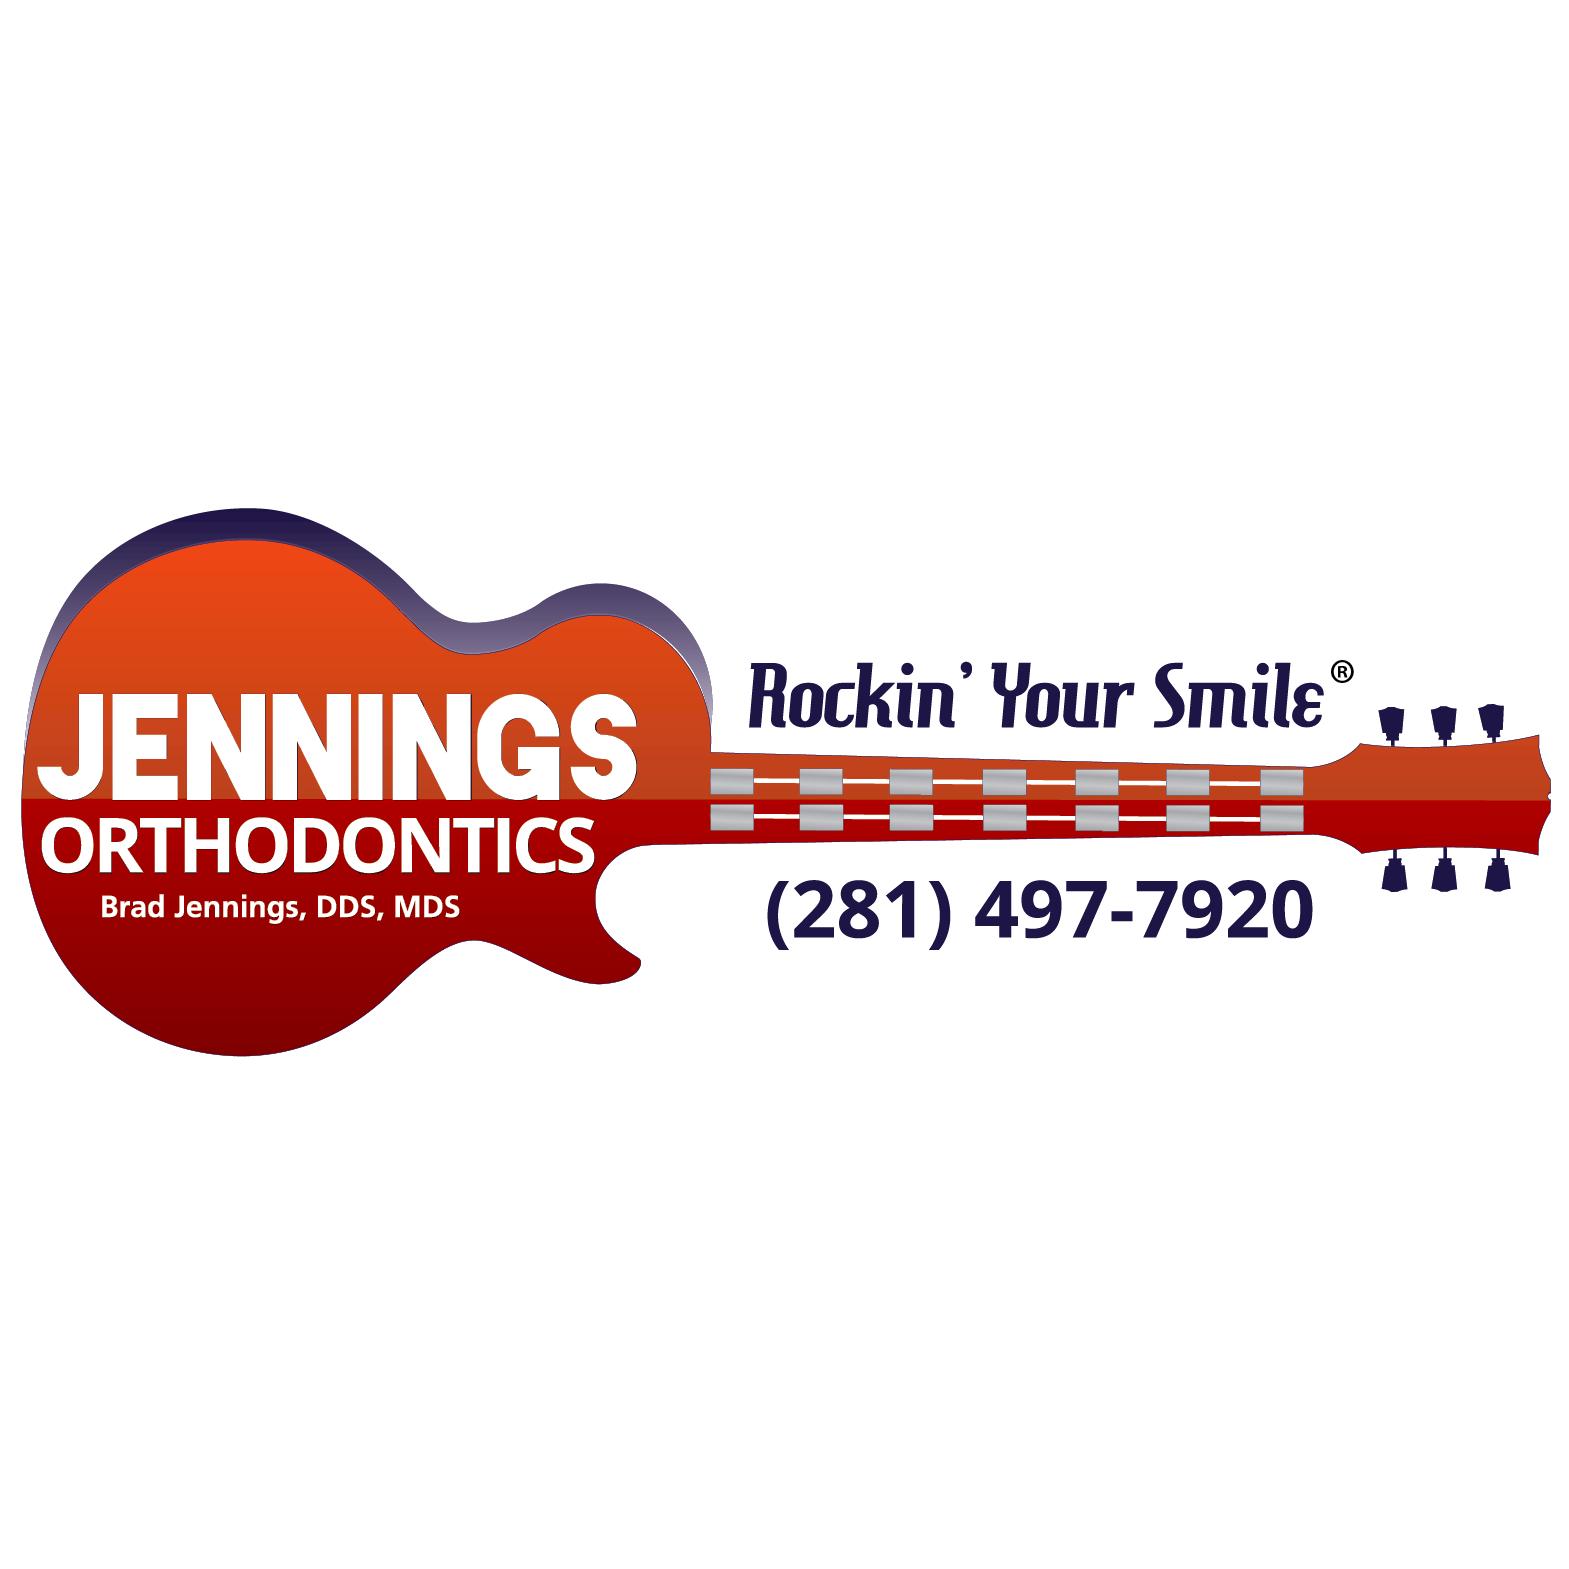 Jennings Orthodontics